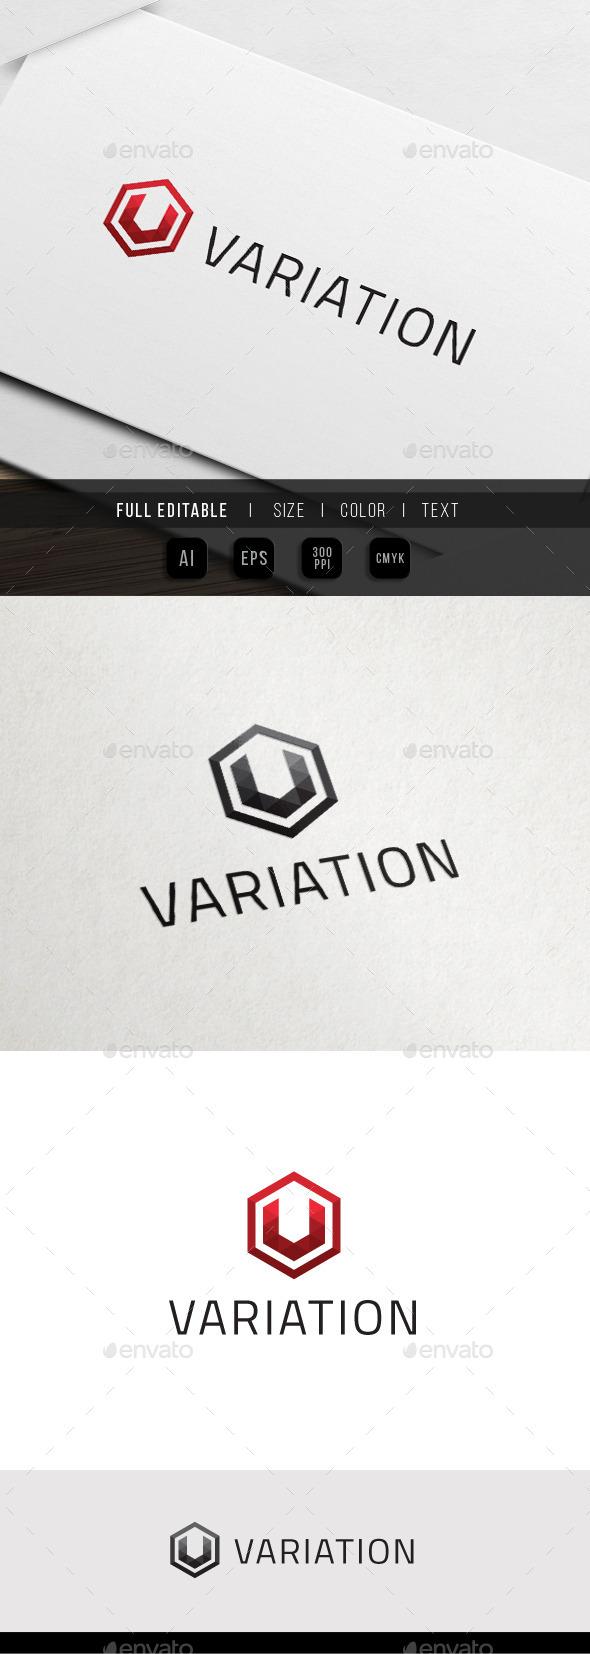 GraphicRiver Hexa Variation Triangle Pixel V Logo 11372941